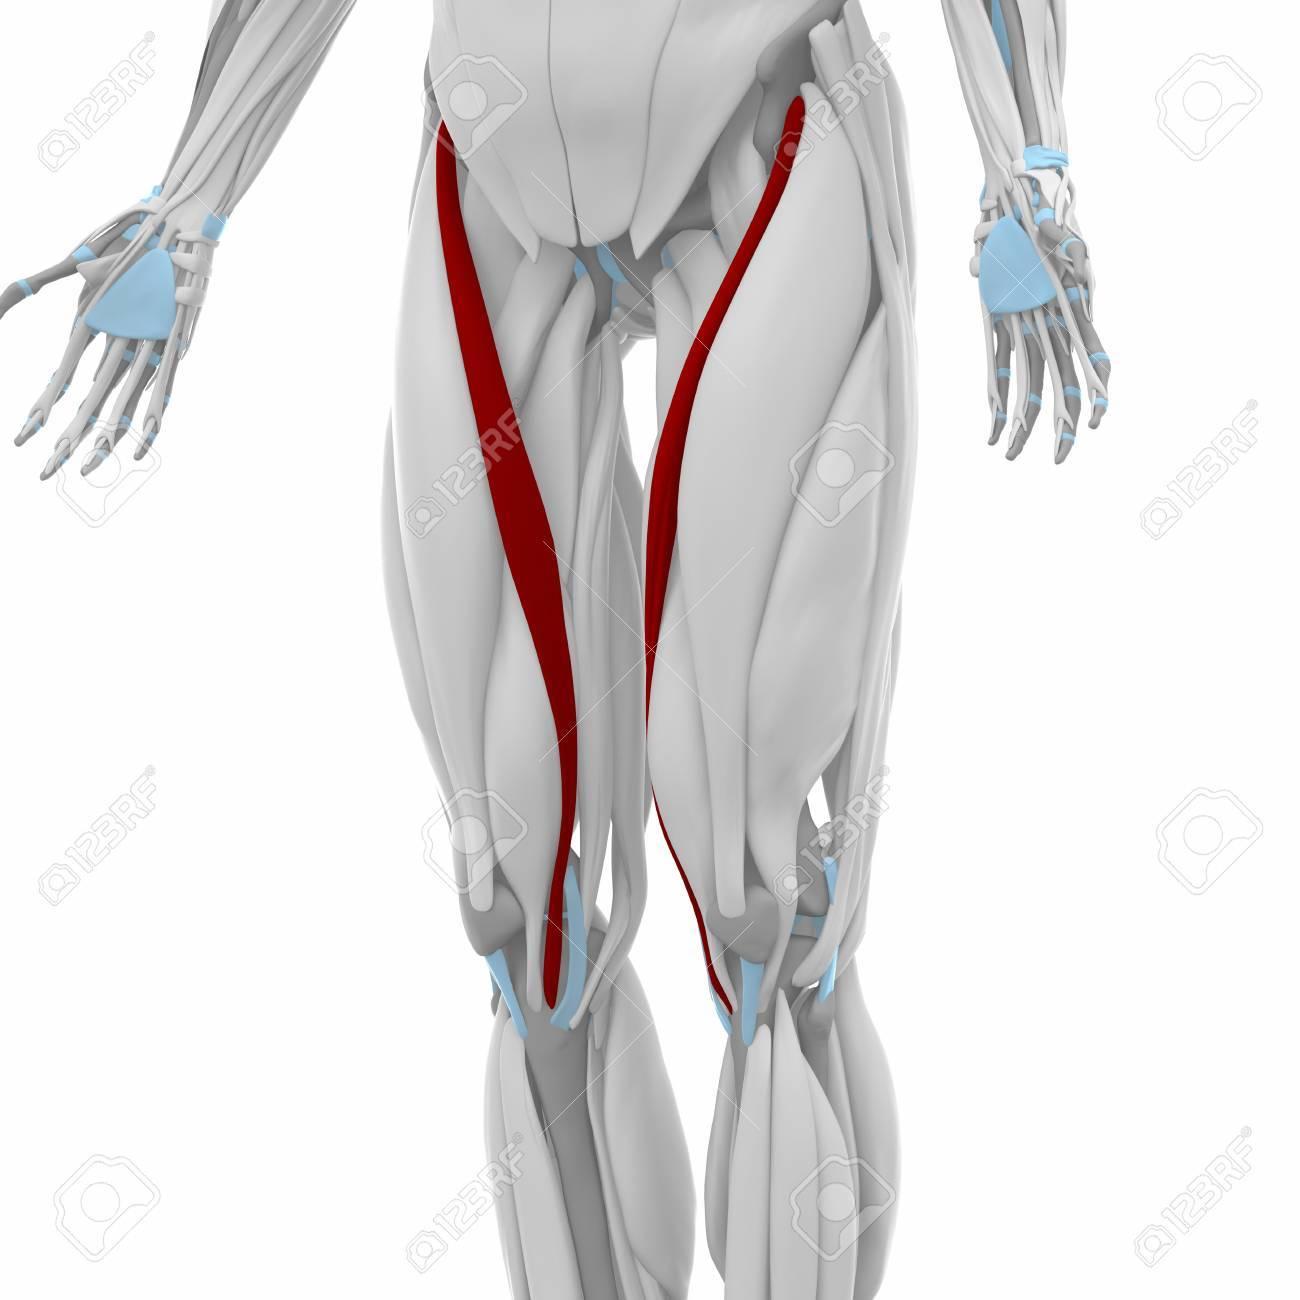 Niedlich Sartorius Muskelanatomie Fotos - Anatomie Ideen - finotti.info